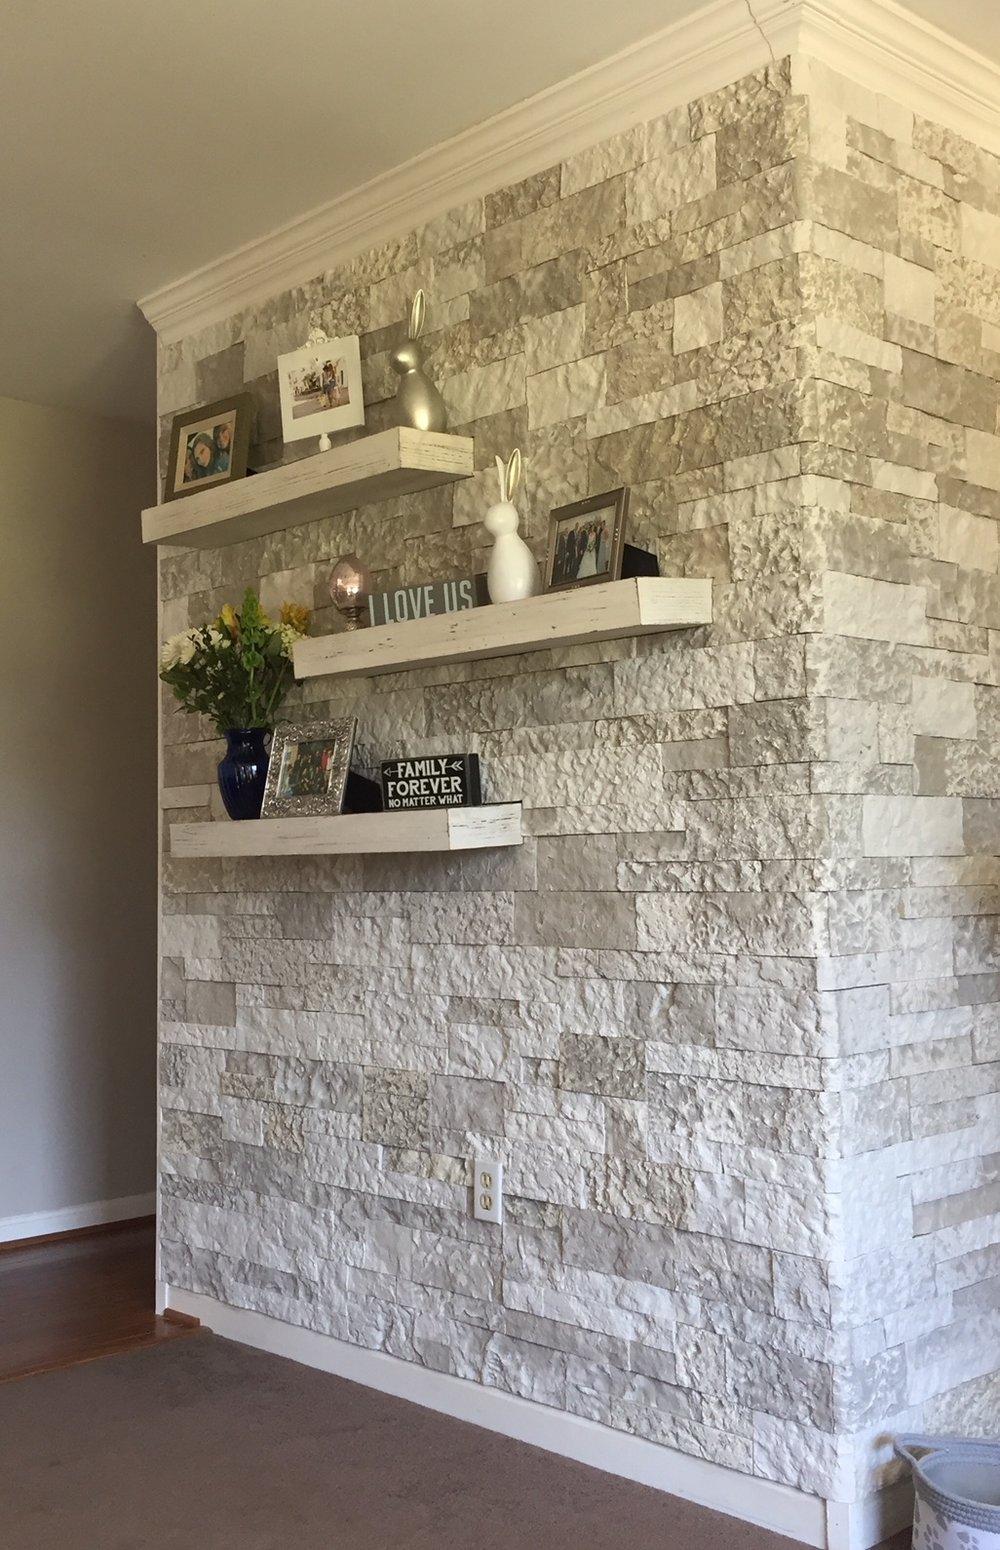 Wall Large.jpg